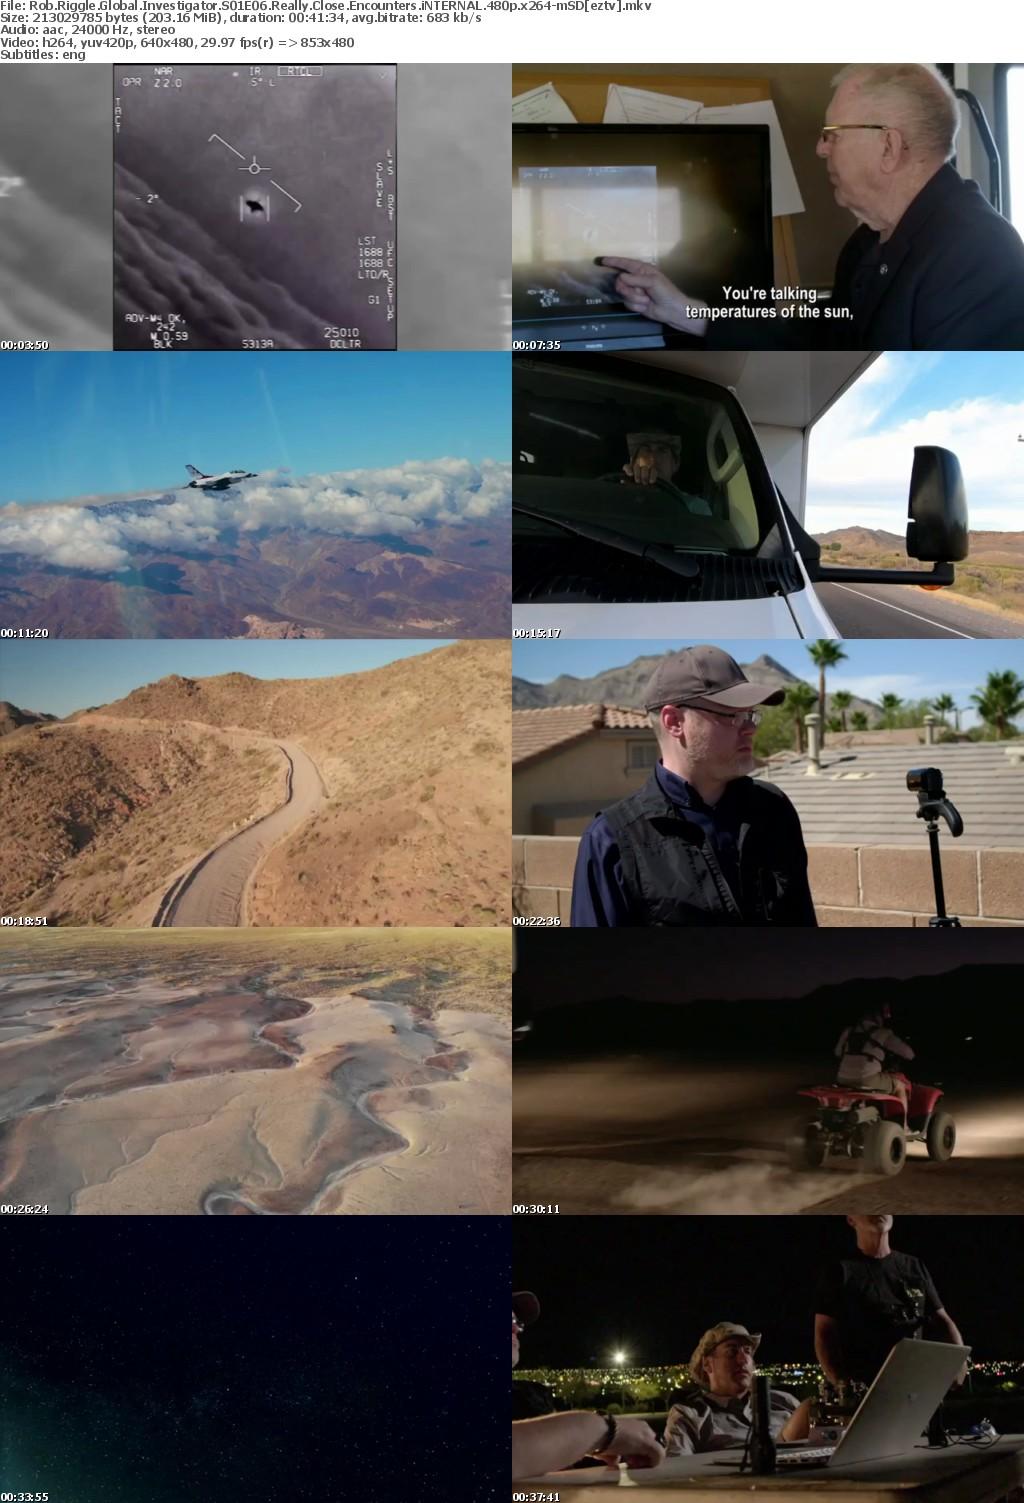 Rob Riggle Global Investigator S01E06 Really Close Encounters iNTERNAL 480p x264-mSD